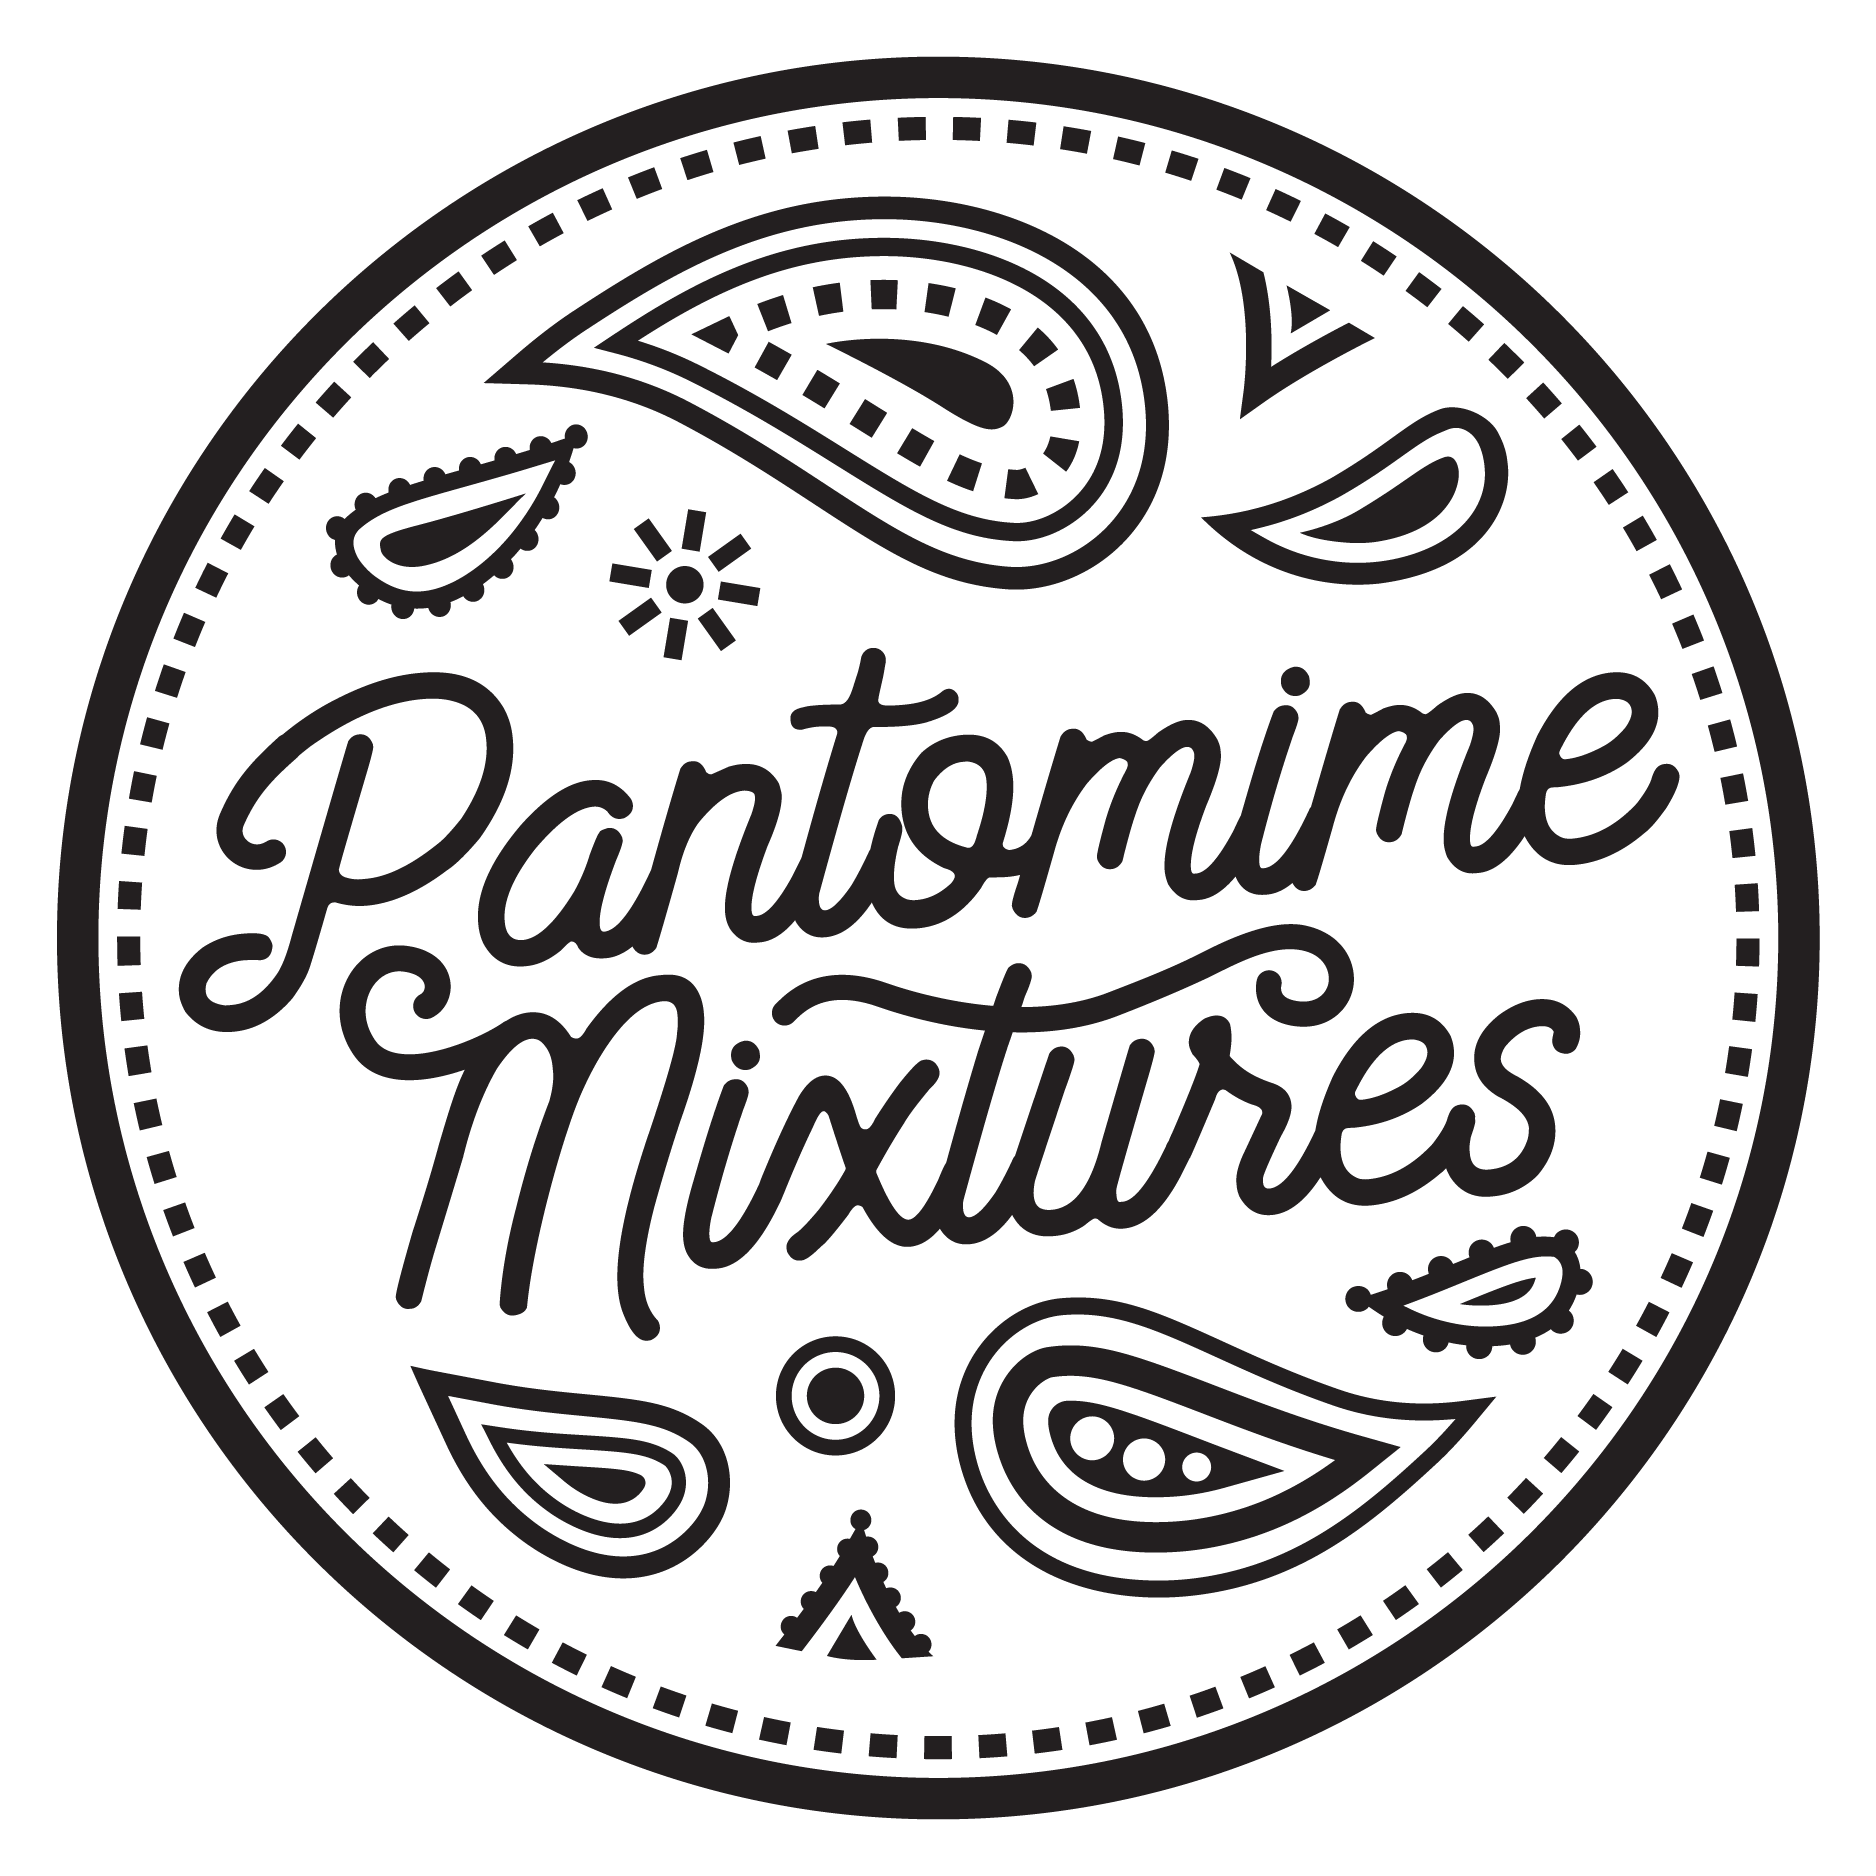 pantomime-01-01.png